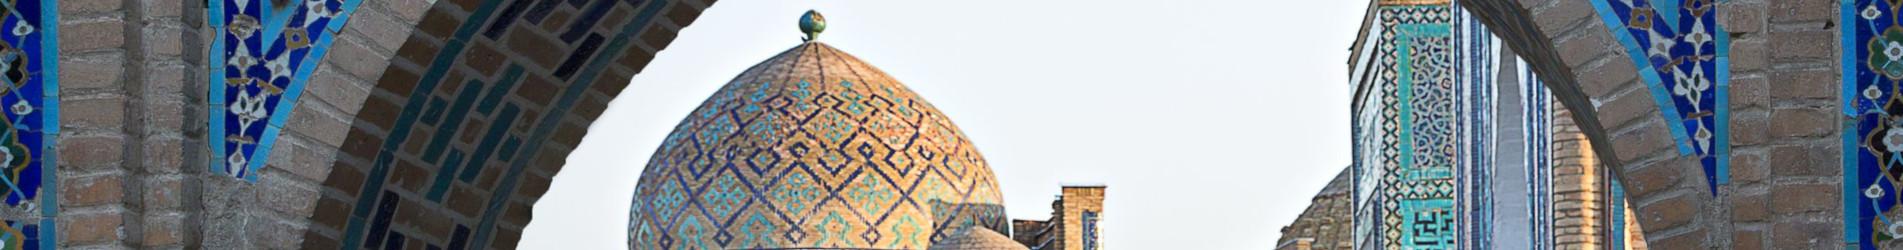 Historischer Friedhof Shahi Zinda in Samarkand